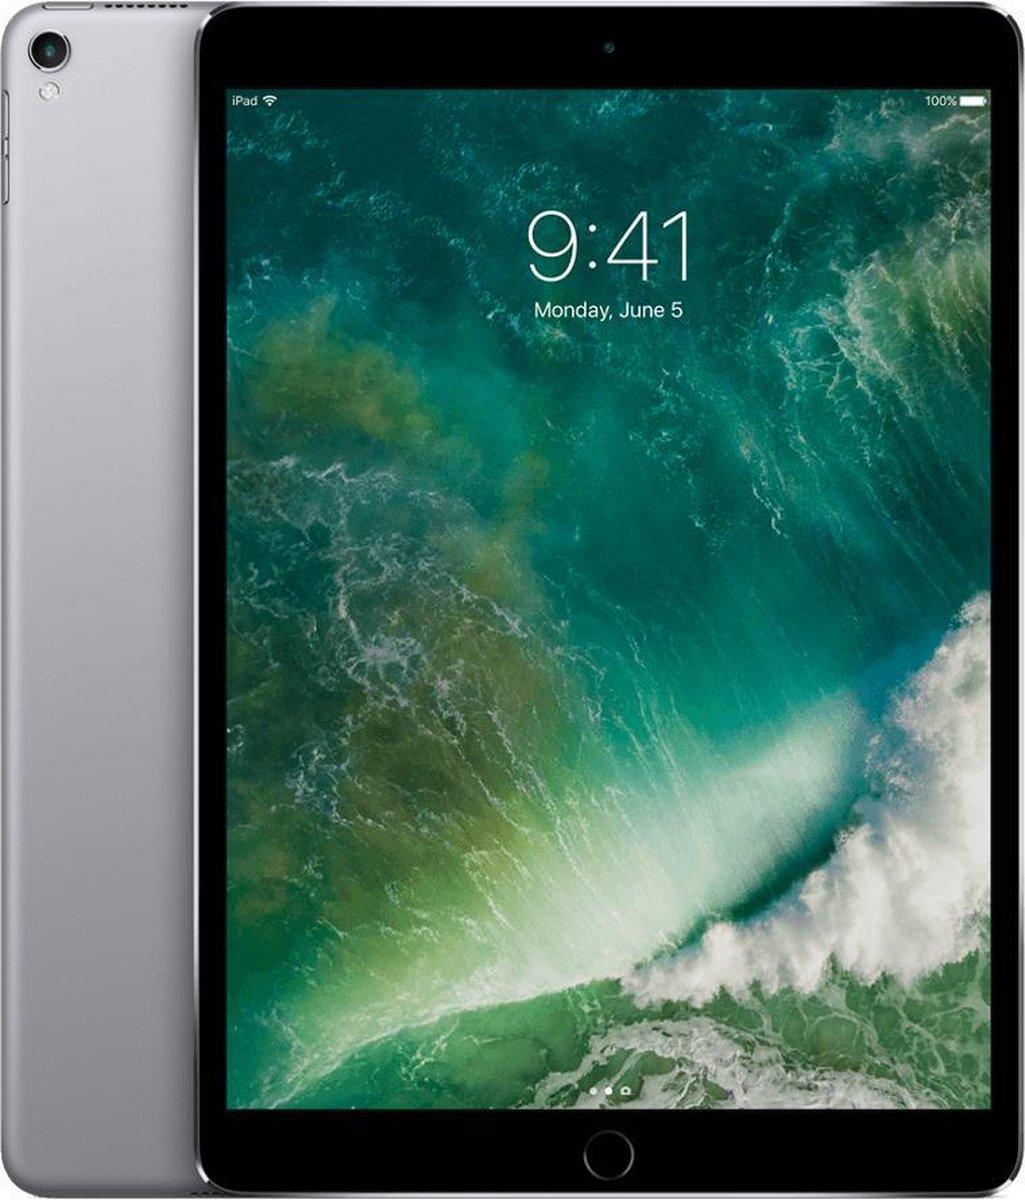 iPad Pro 10.5 64gb WiFi + Cellular Space - Trixon refurb